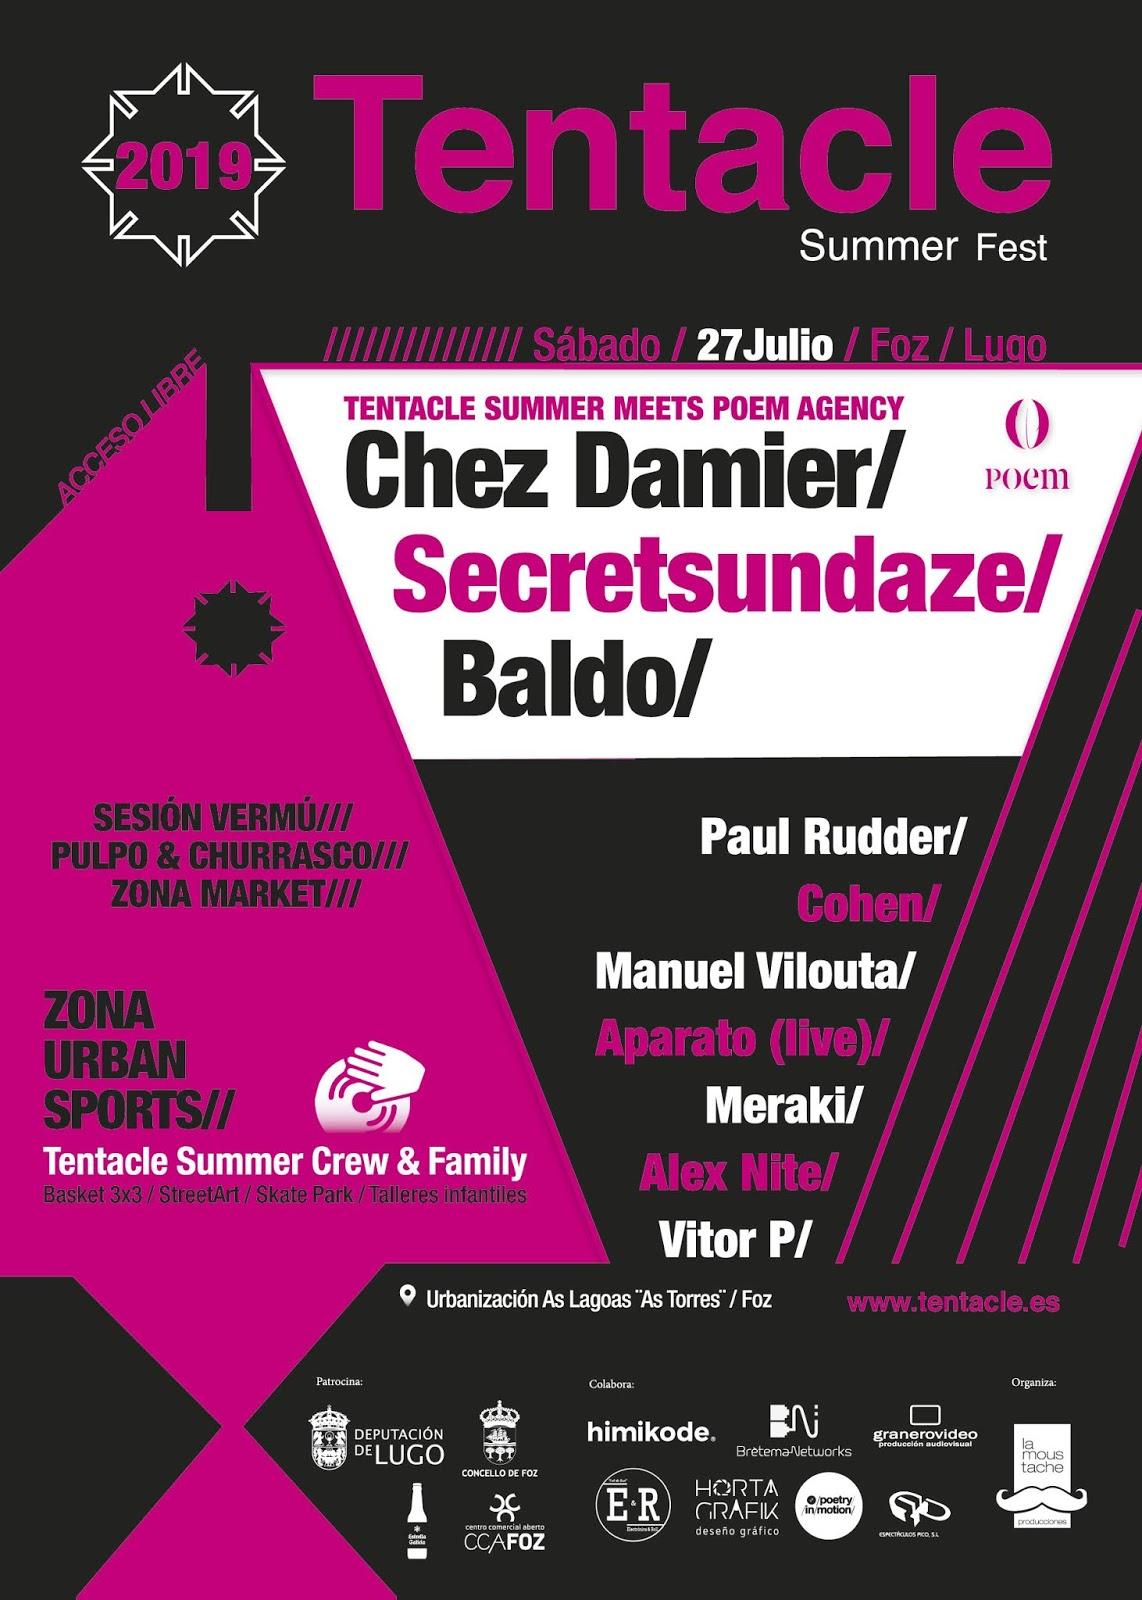 Tentacle Summer Fest 2019 en Foz - Lugo